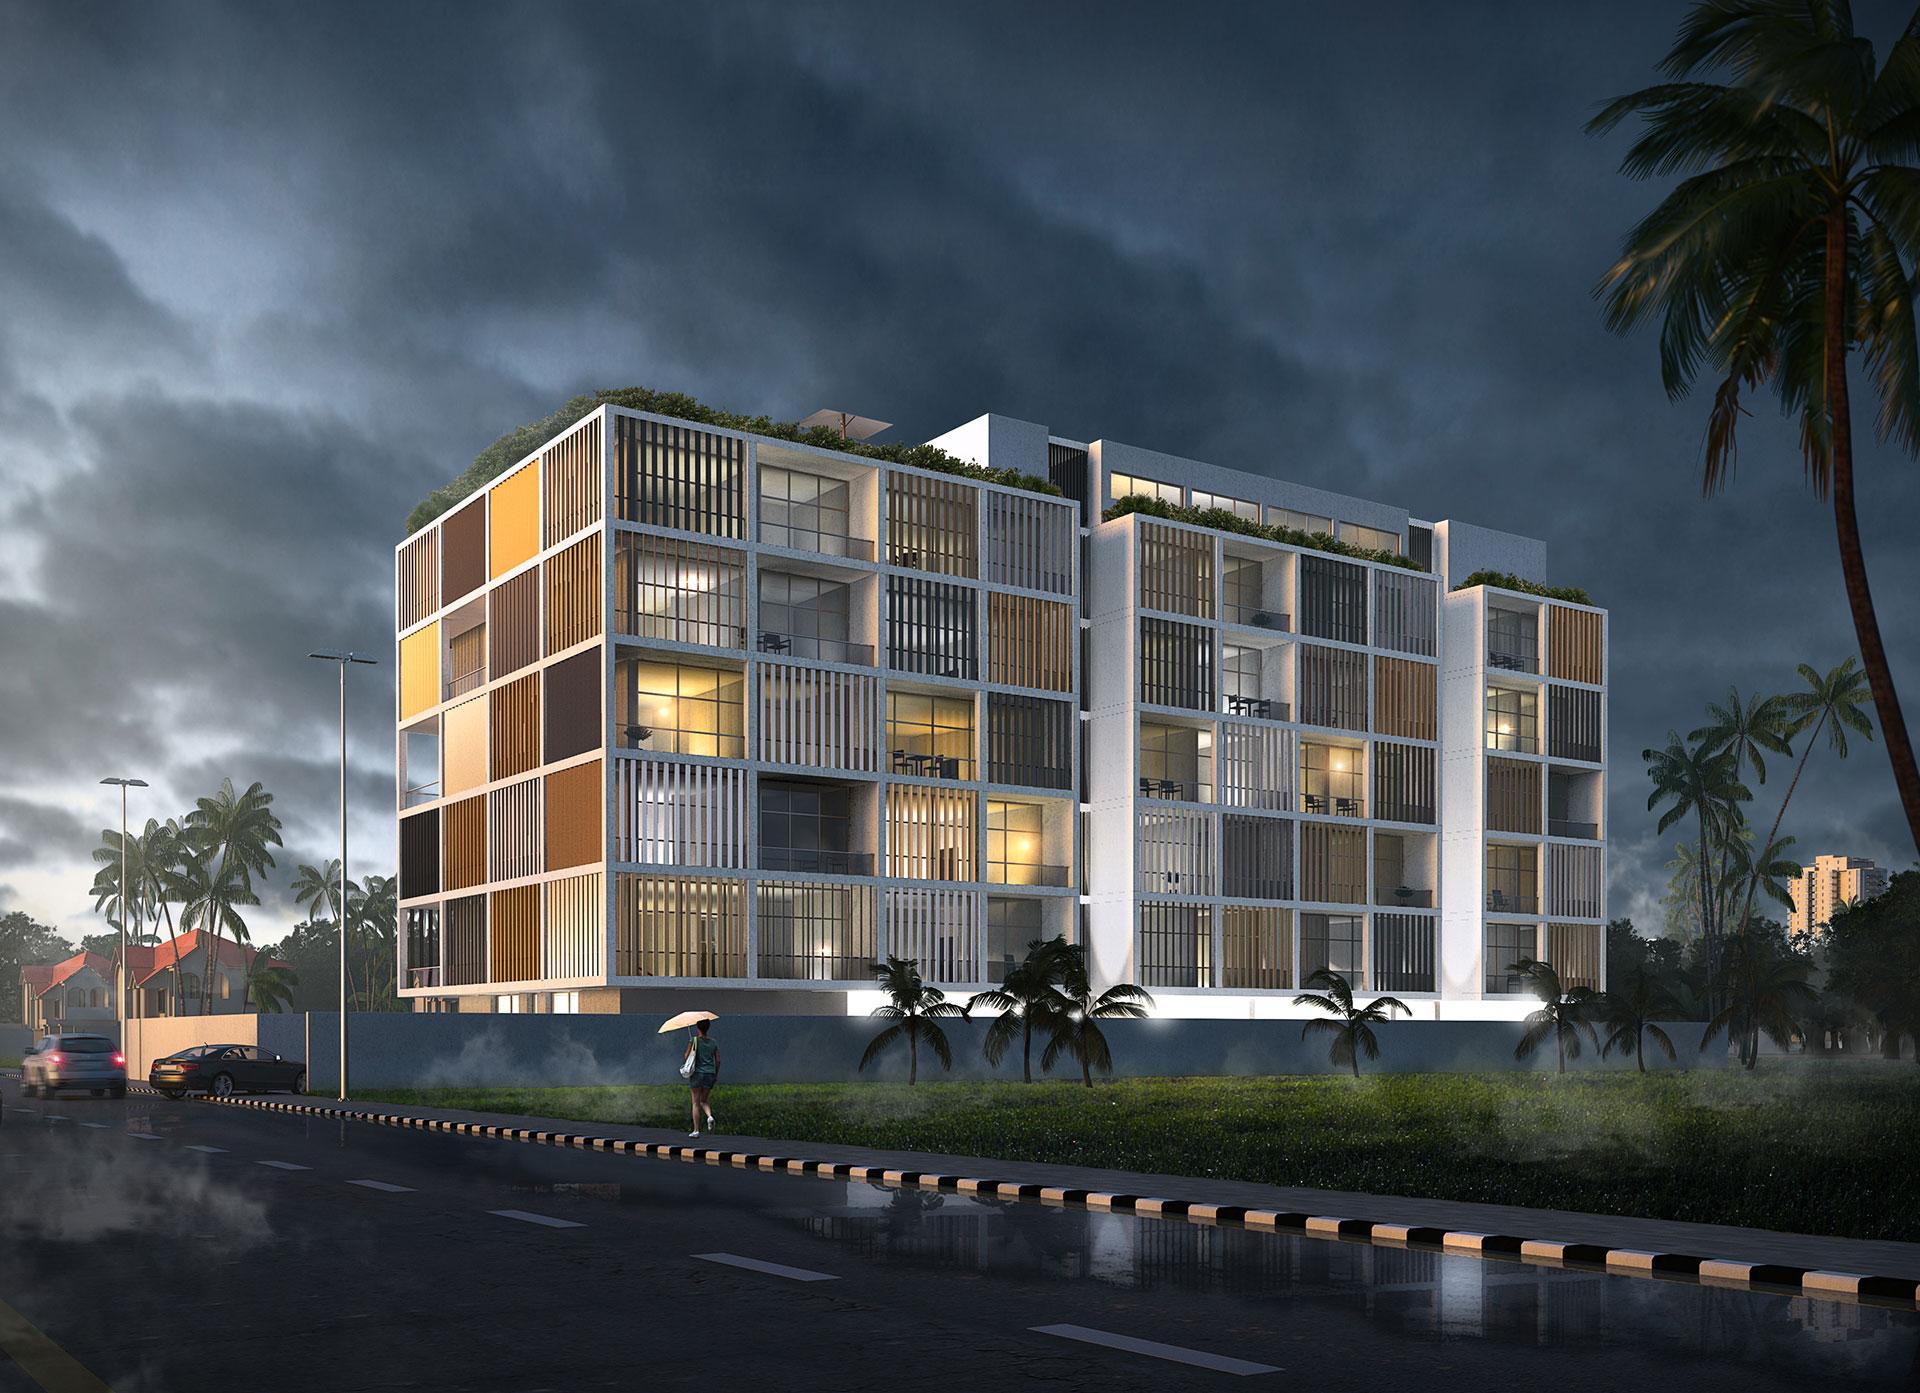 Residential Building / Lagos - Nigeria / Mohamad Makkouk